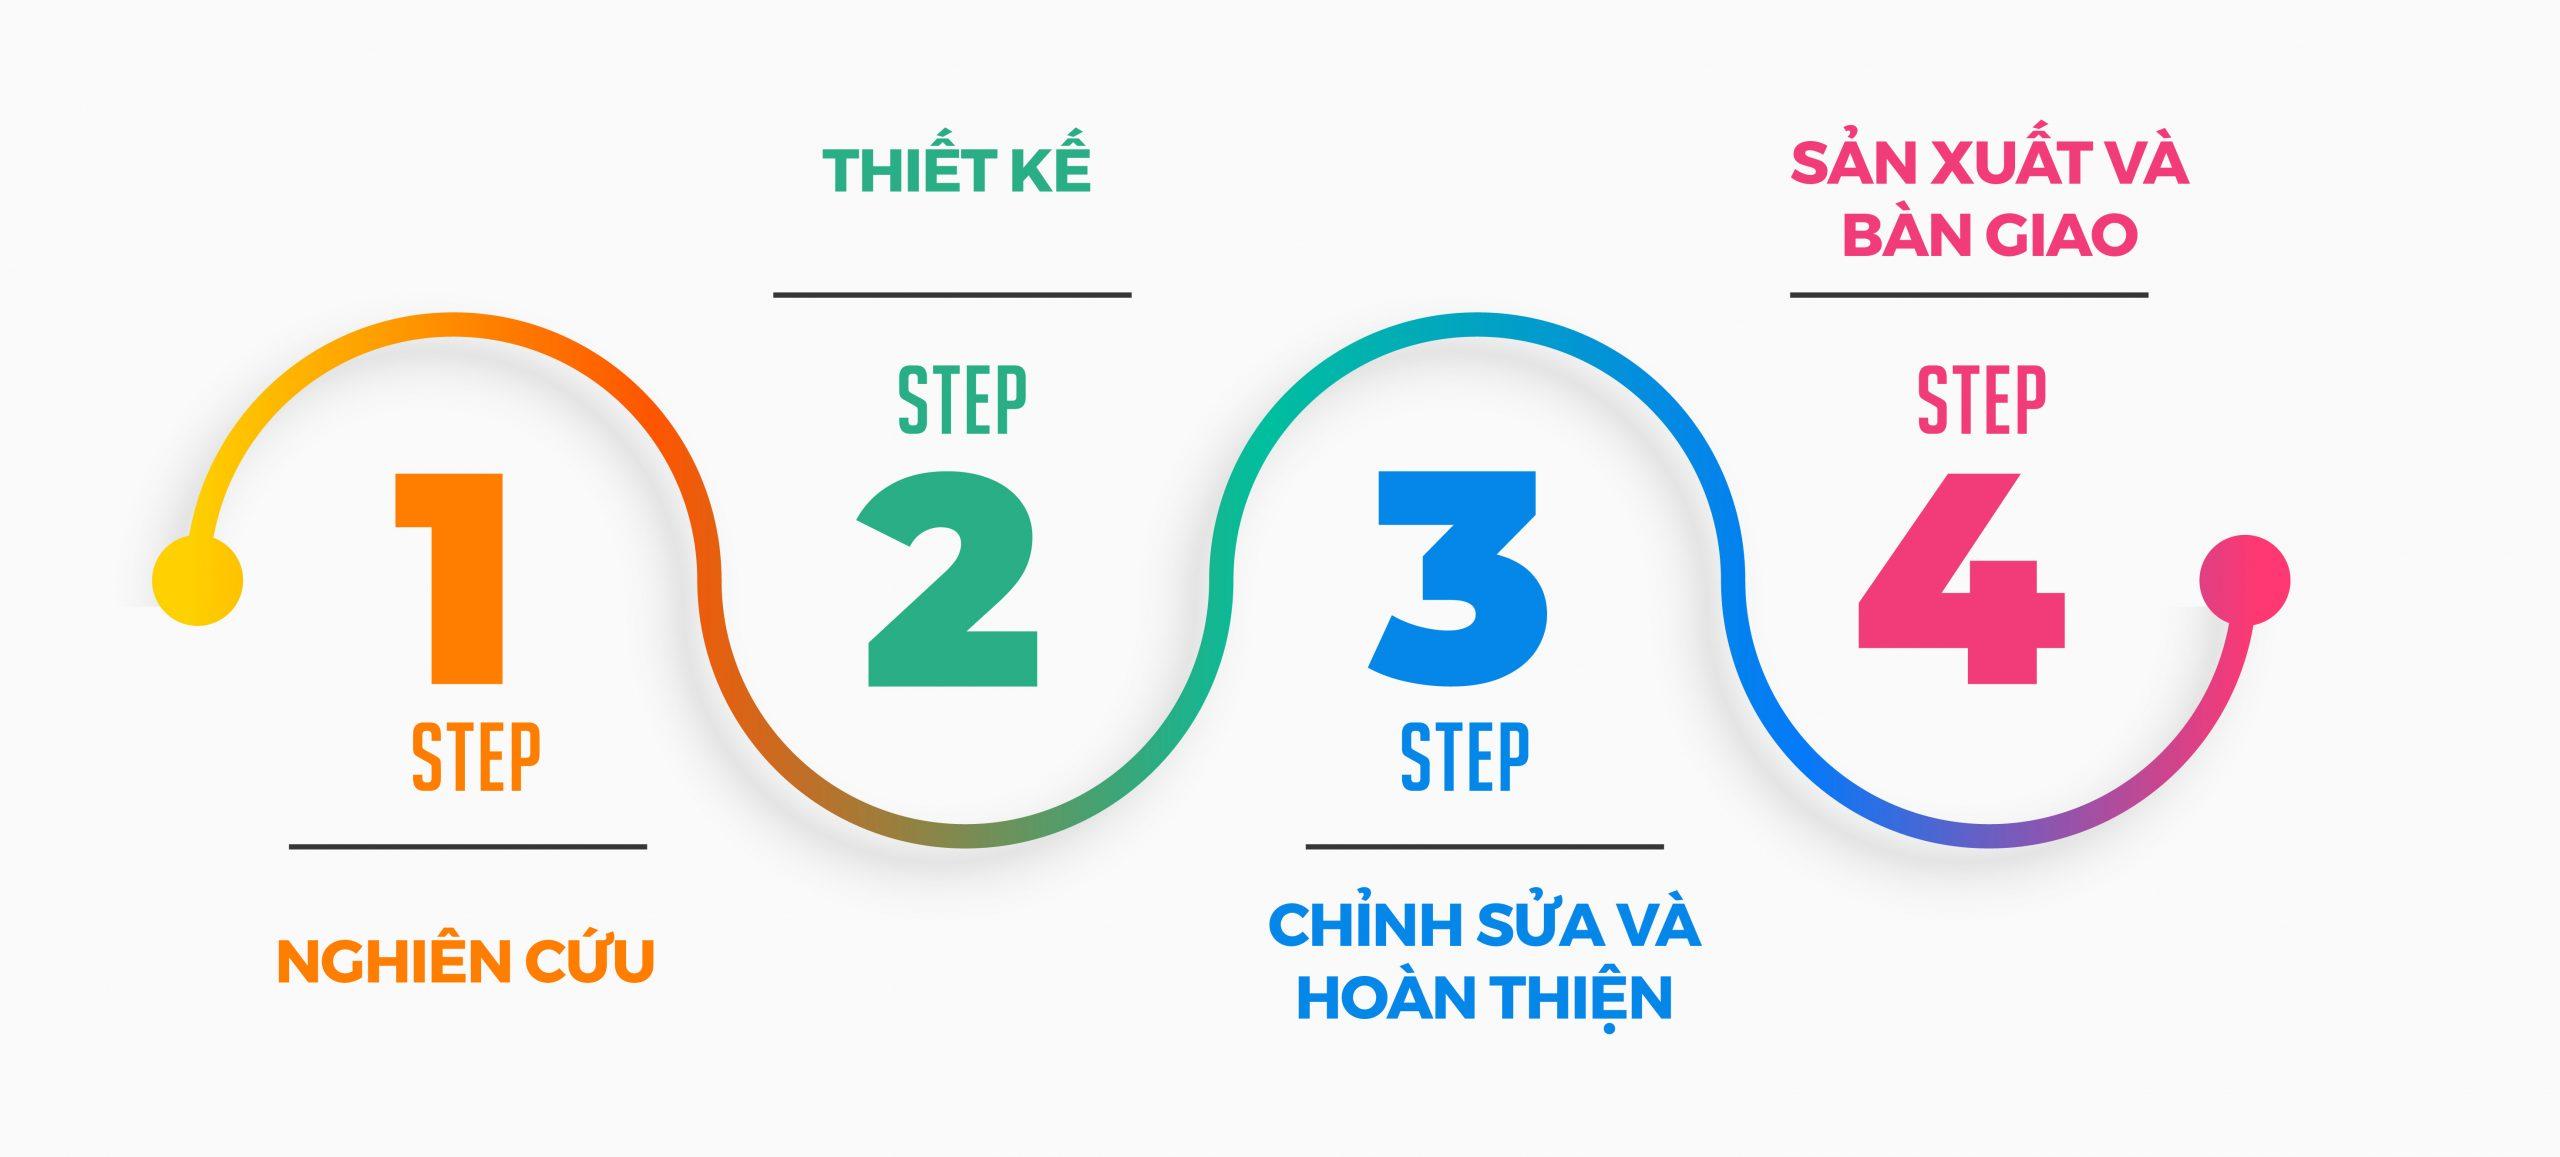 nguyen-tac-thiet-ke-logo-chuyen-nghiep-5